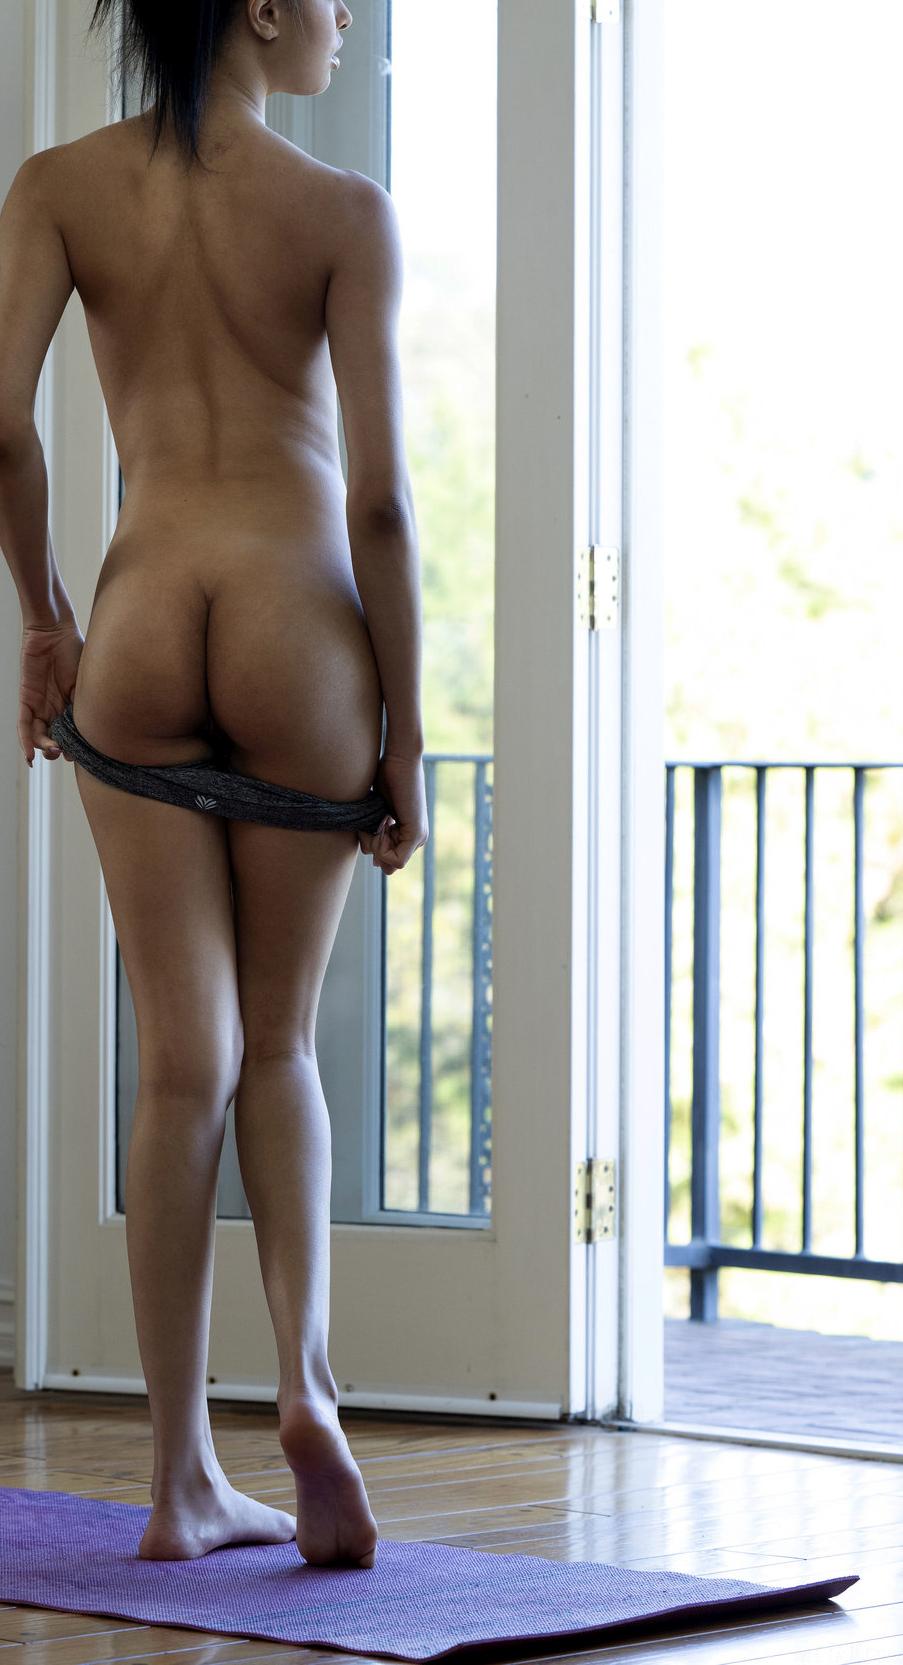 Scarlett Bloom showing her ass